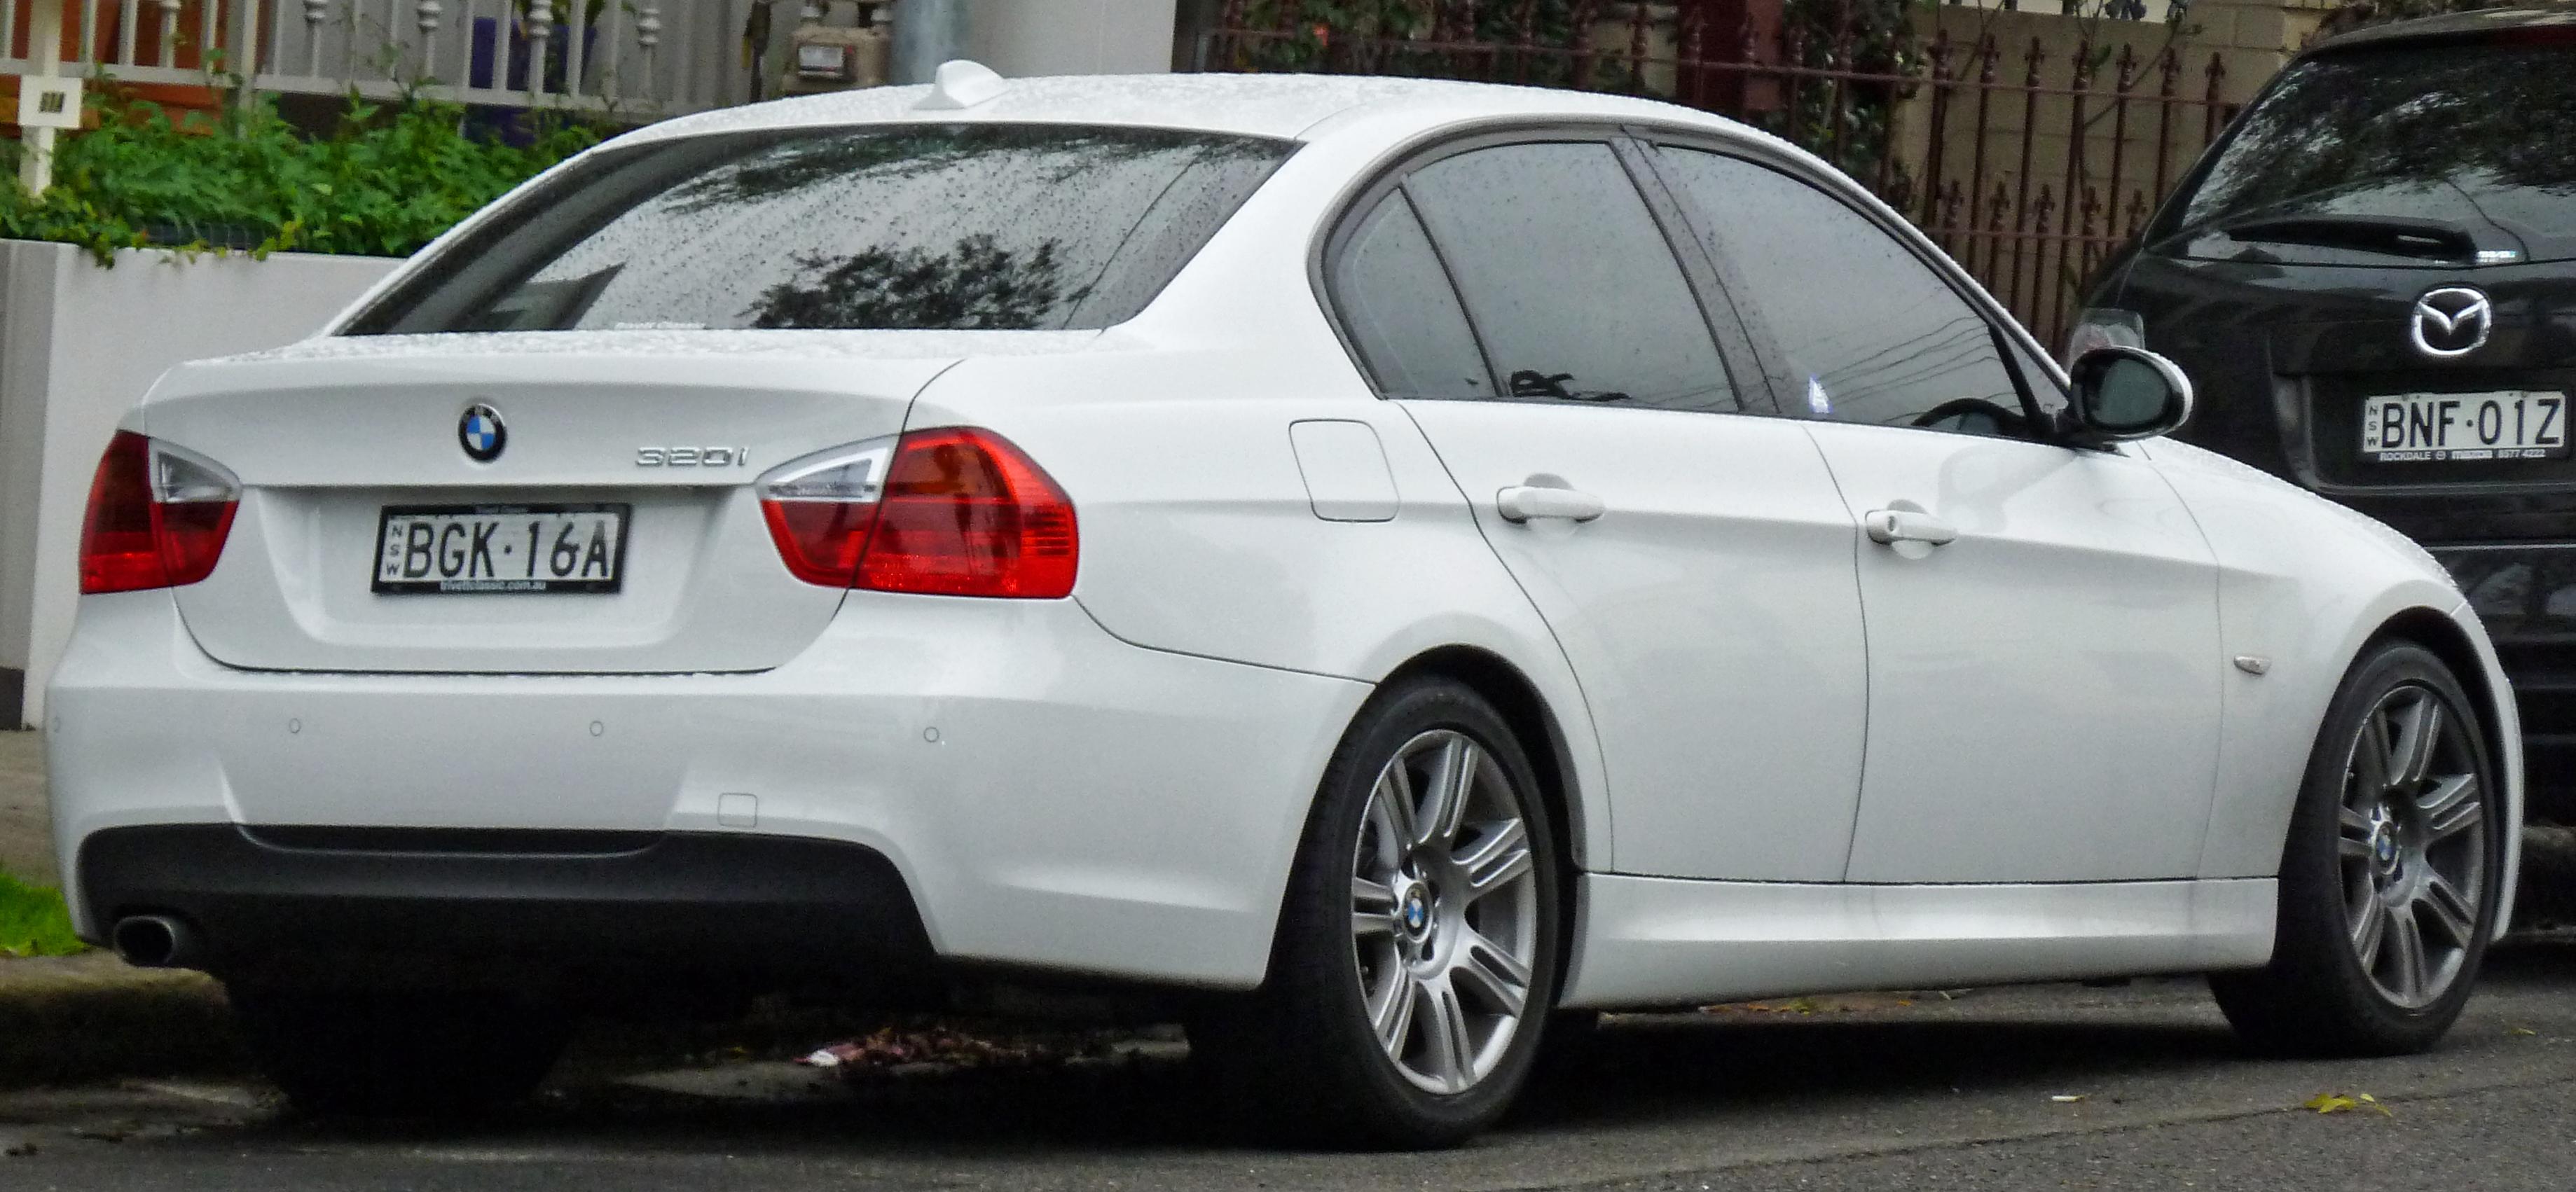 Bmw E90 Wiki >> File:2005-2008 BMW 320i (E90) sedan (2011-05-26).jpg - Wikimedia Commons